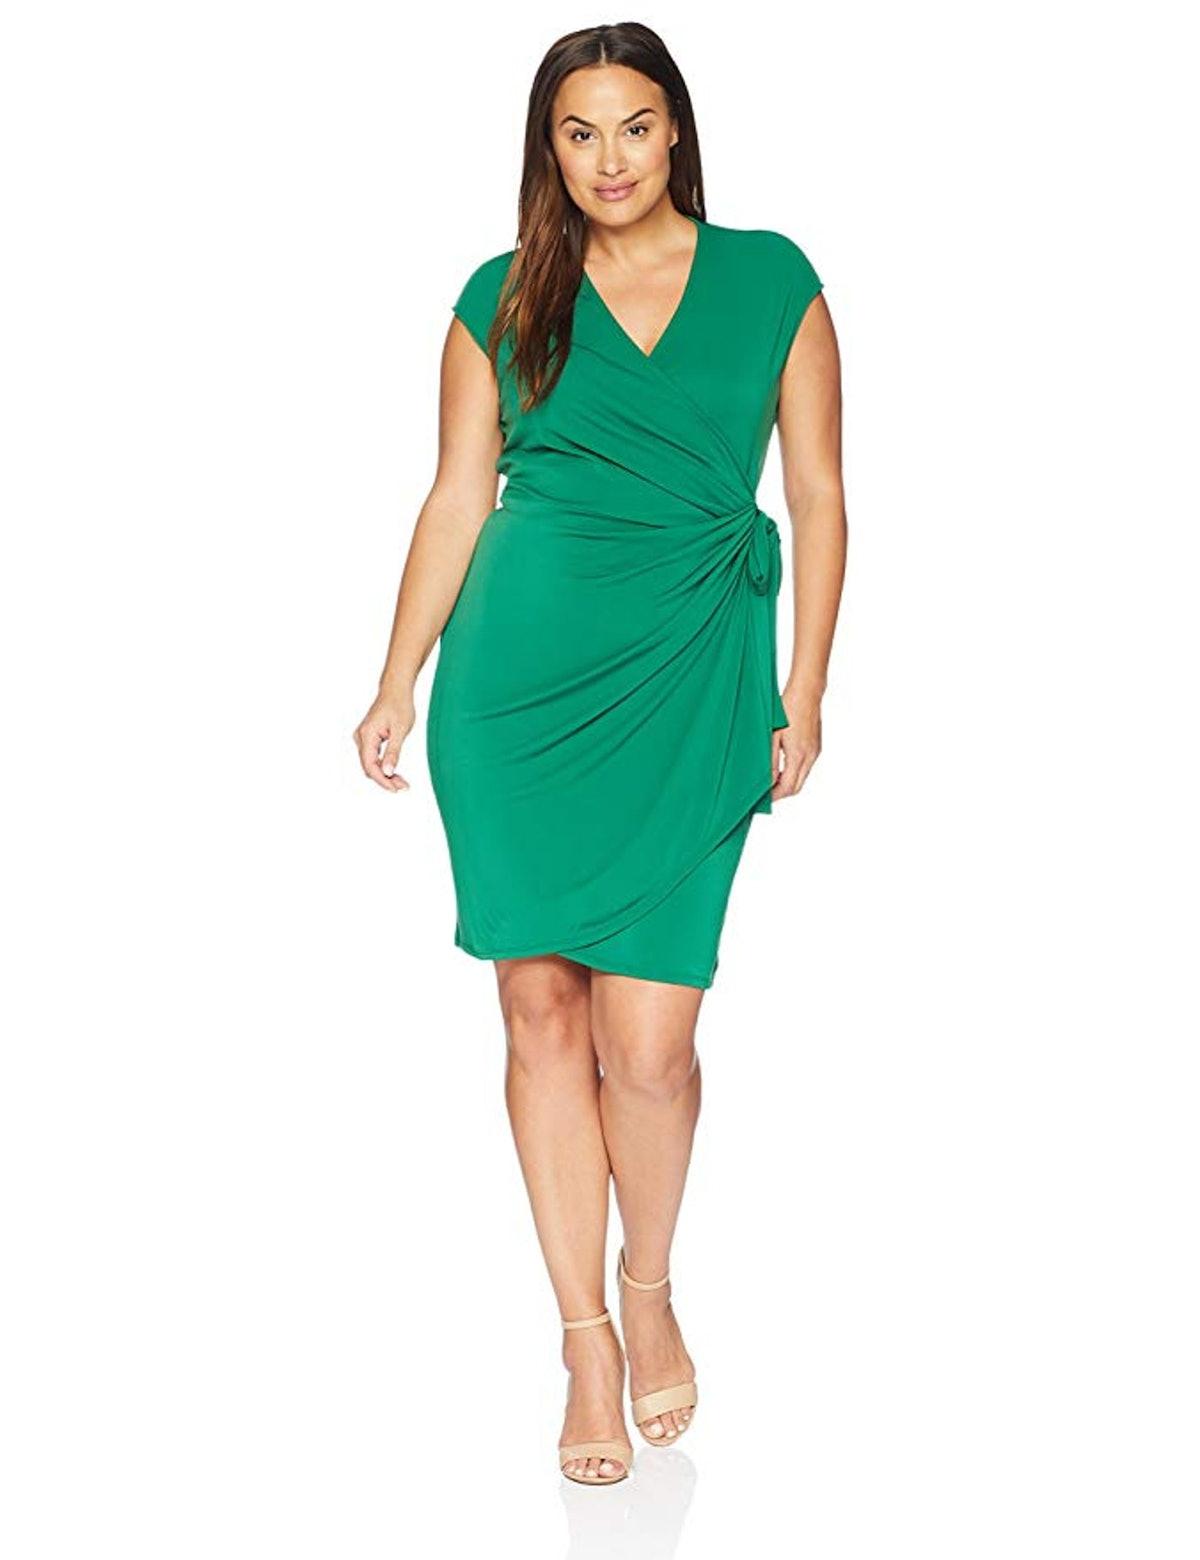 Lark & Ro Women's Plus Size Classic Cap Sleeve Wrap Dress